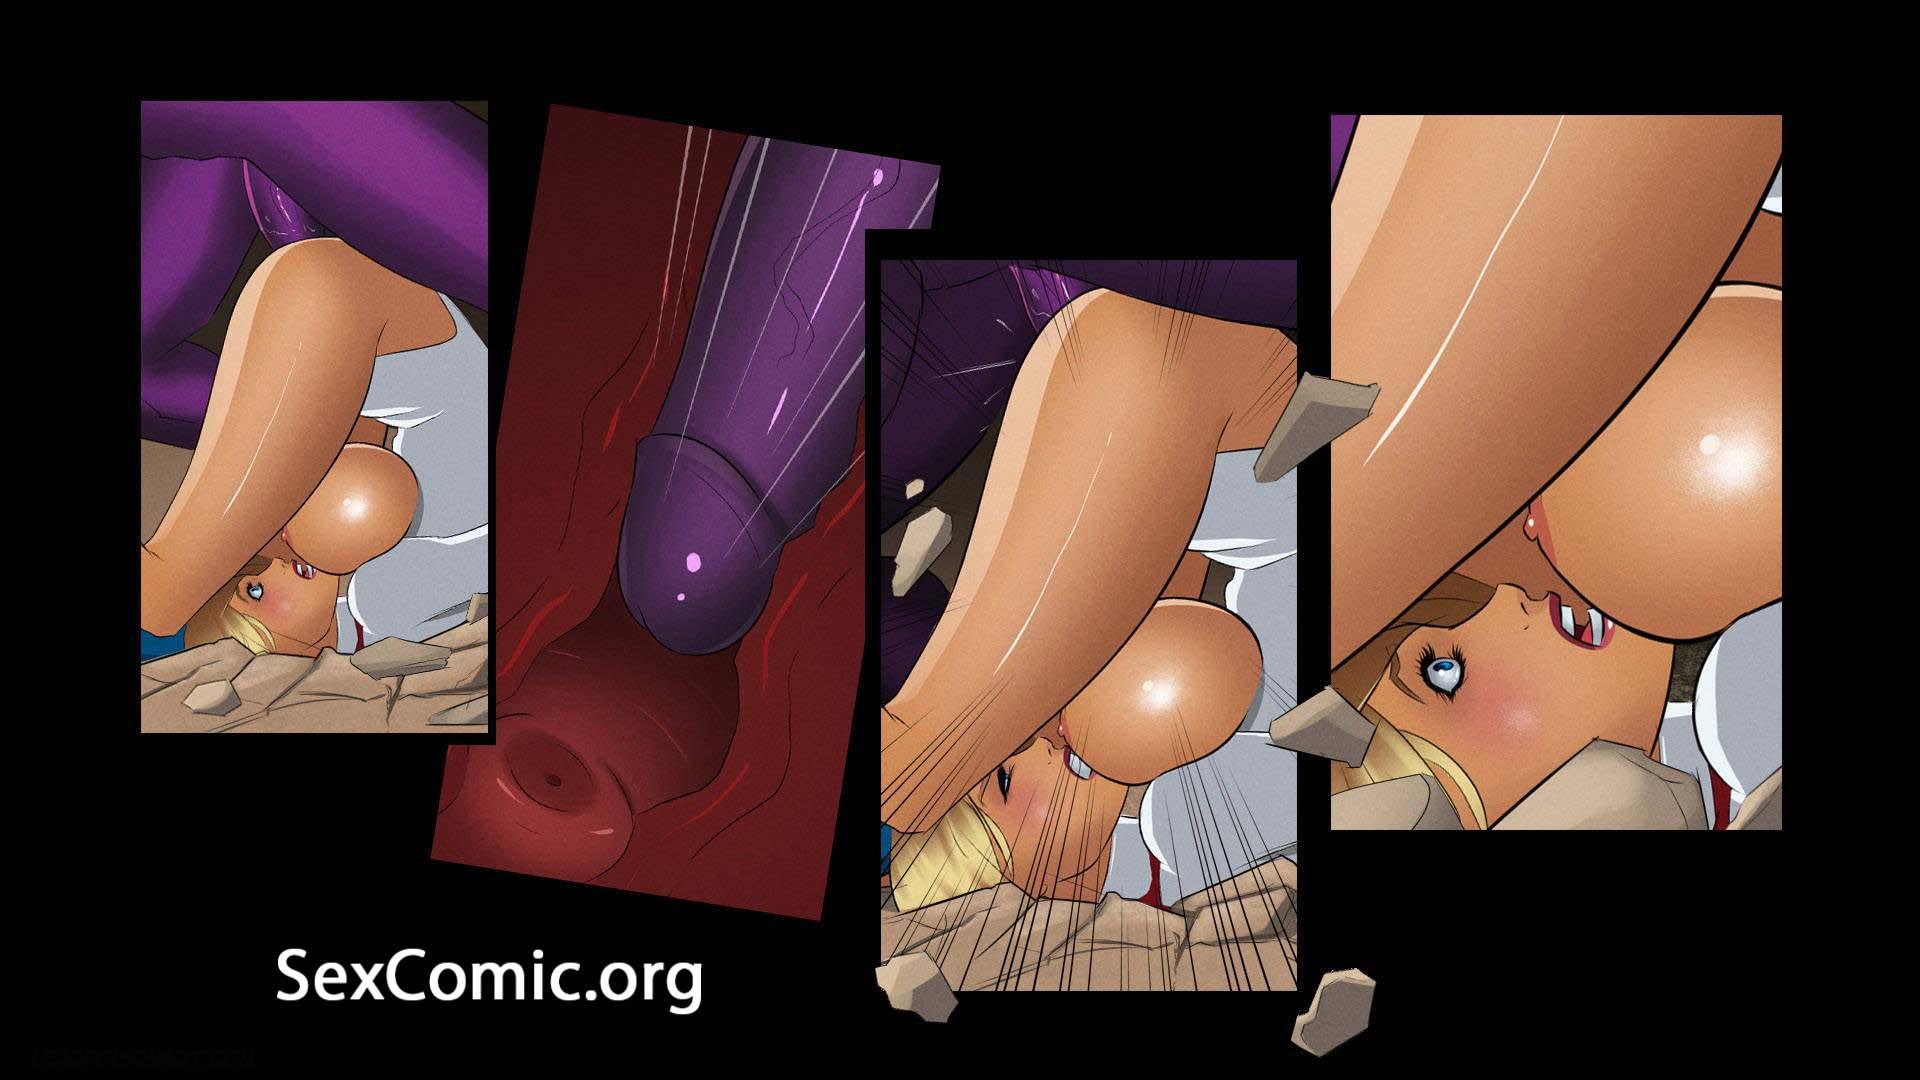 comic-marverl-xxx-atrapando-ala-famosa-powergirl-historias-eroticas-mangas-para-adultos-fantasias-sexuales-videos-incesto-comics-zoofilia-hentai-gratis-online-20